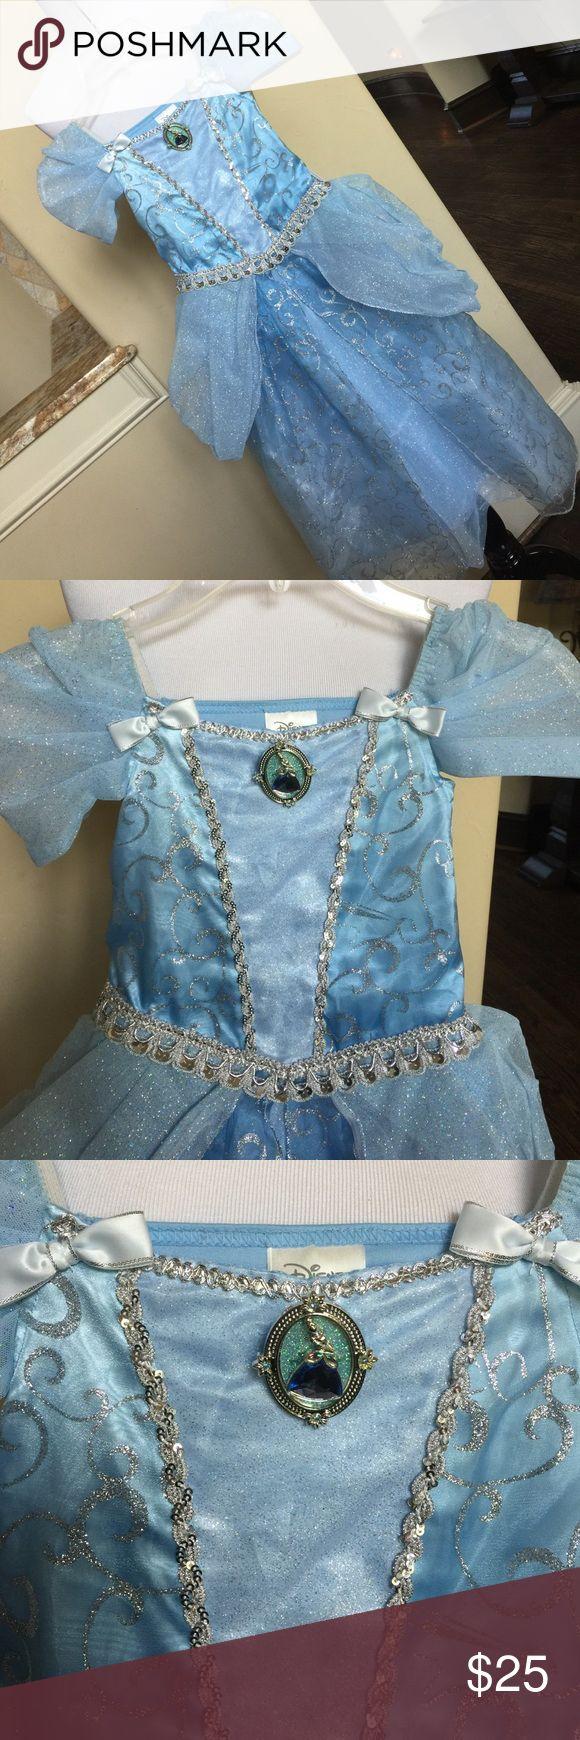 Dresses skirts clothes women disney store - Disney Store Cinderella Dress